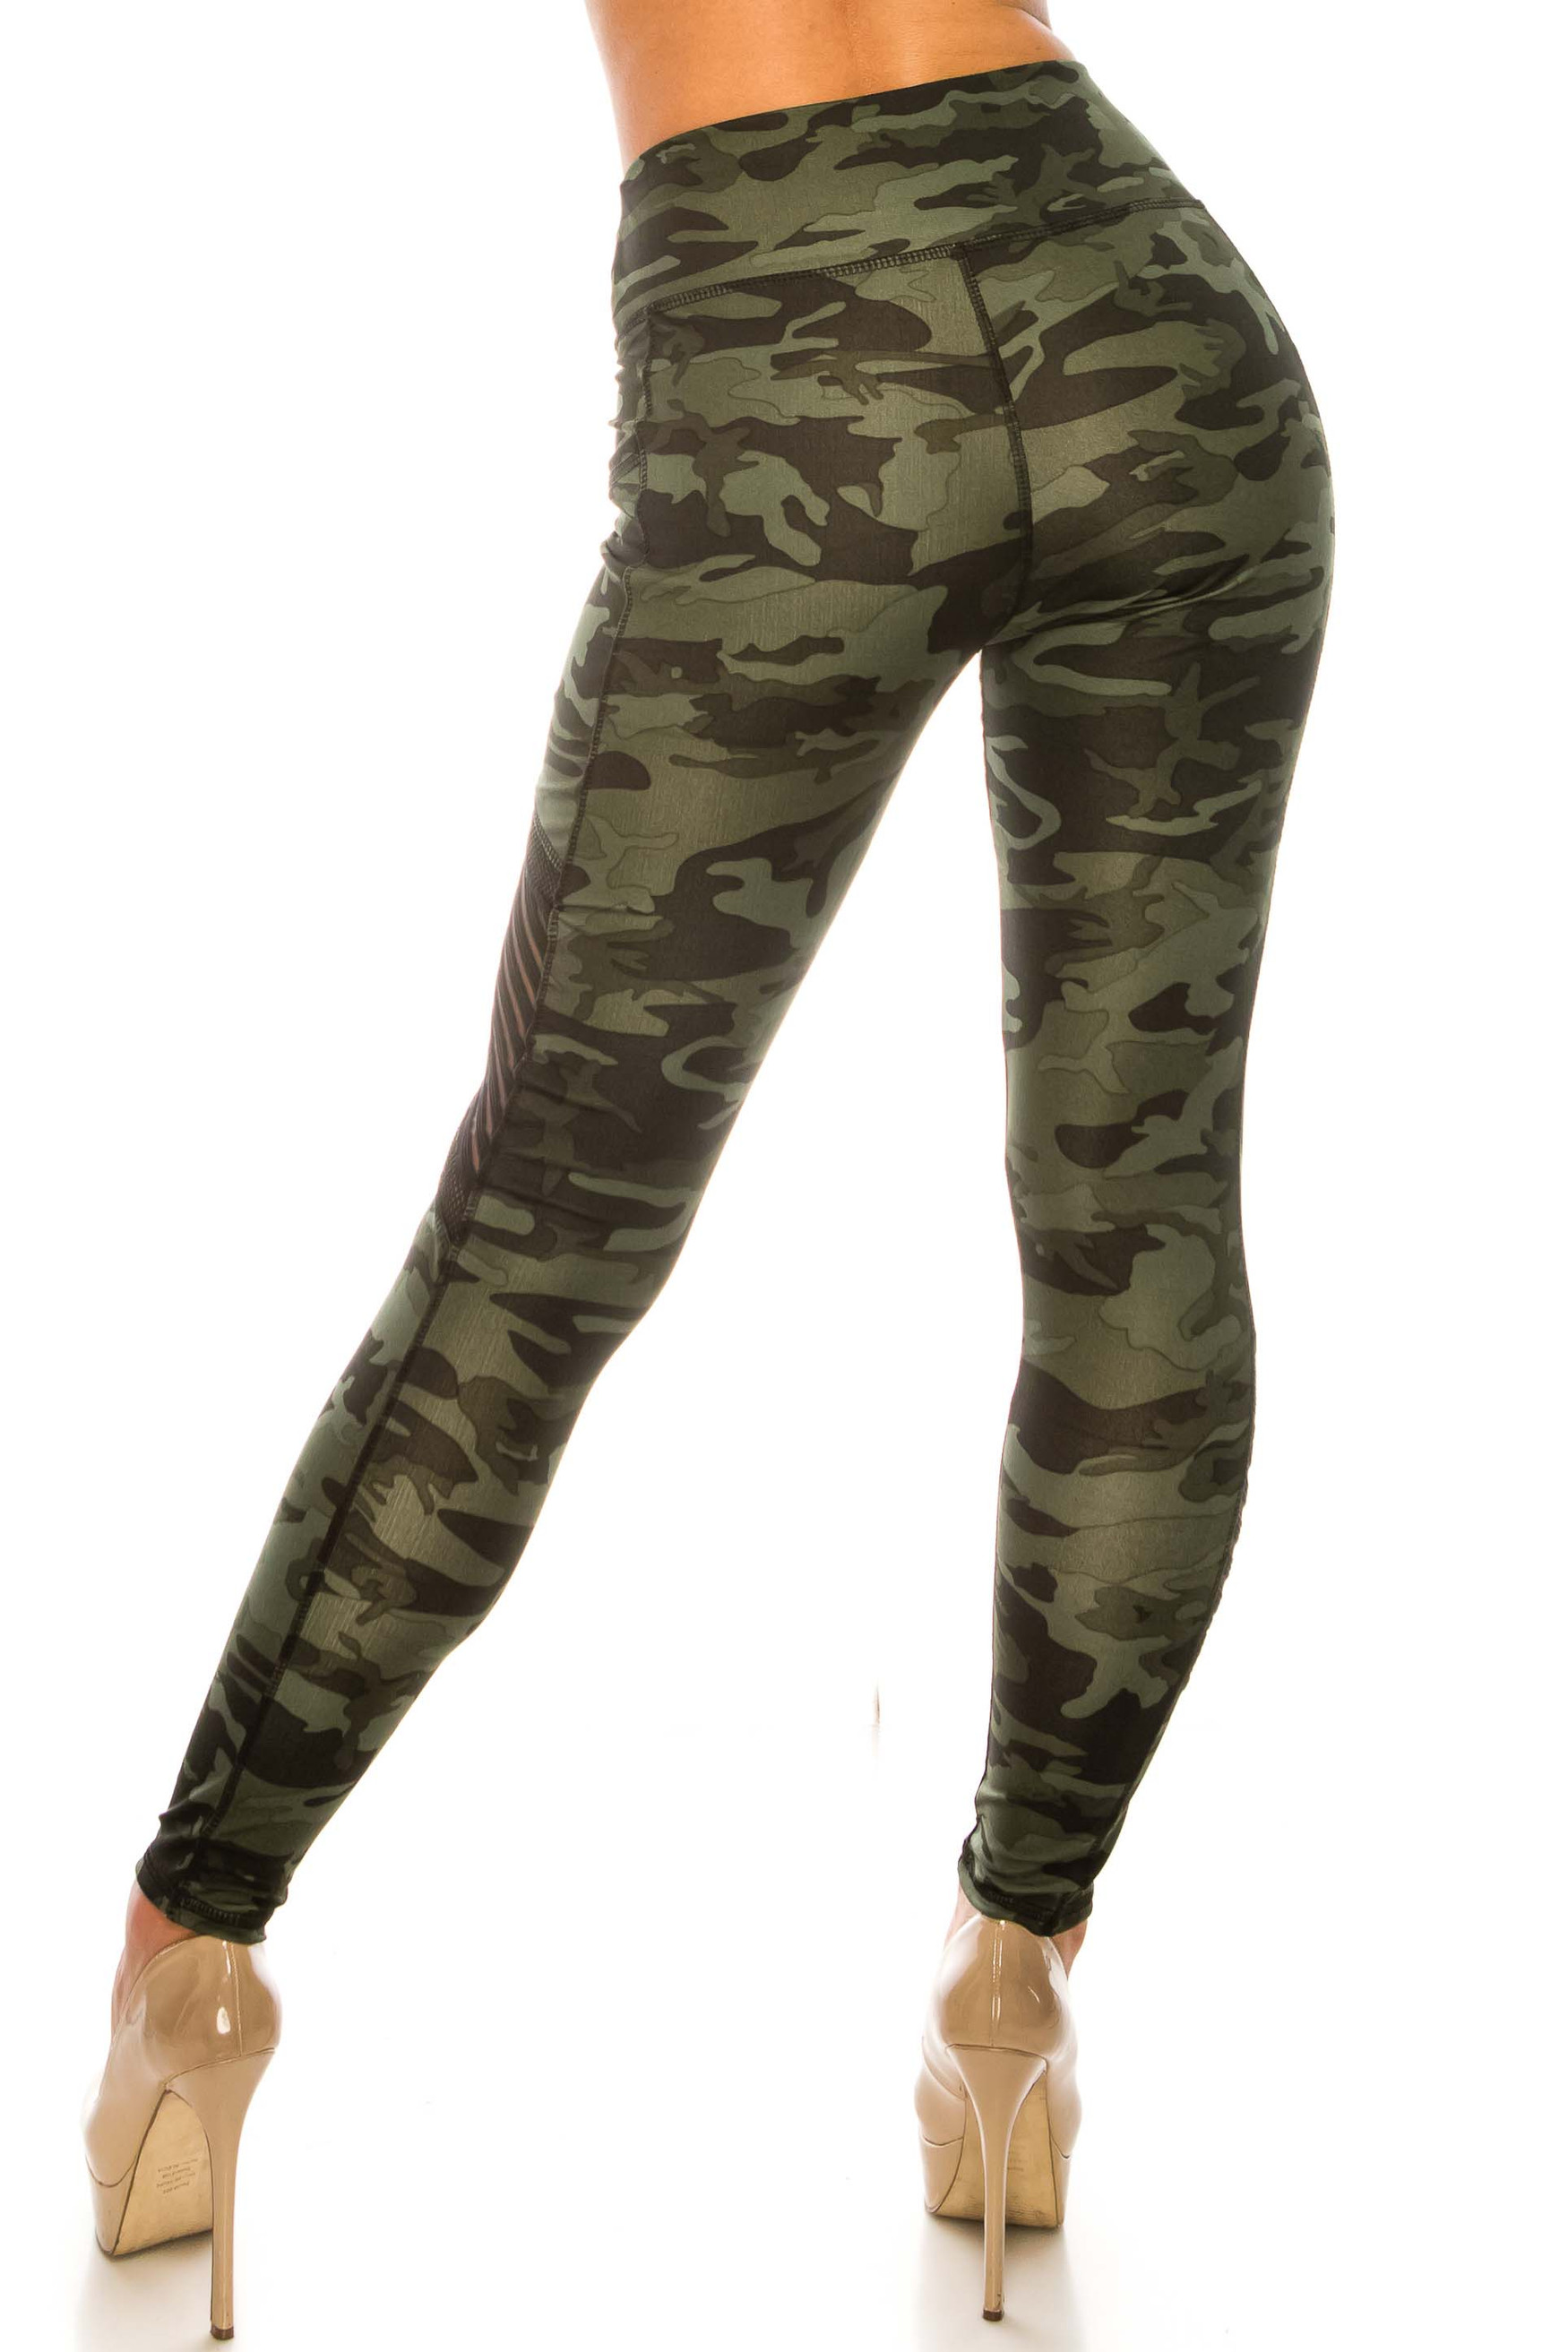 Dark Olive Camouflage Serrated Mesh High Waisted Sport Leggings